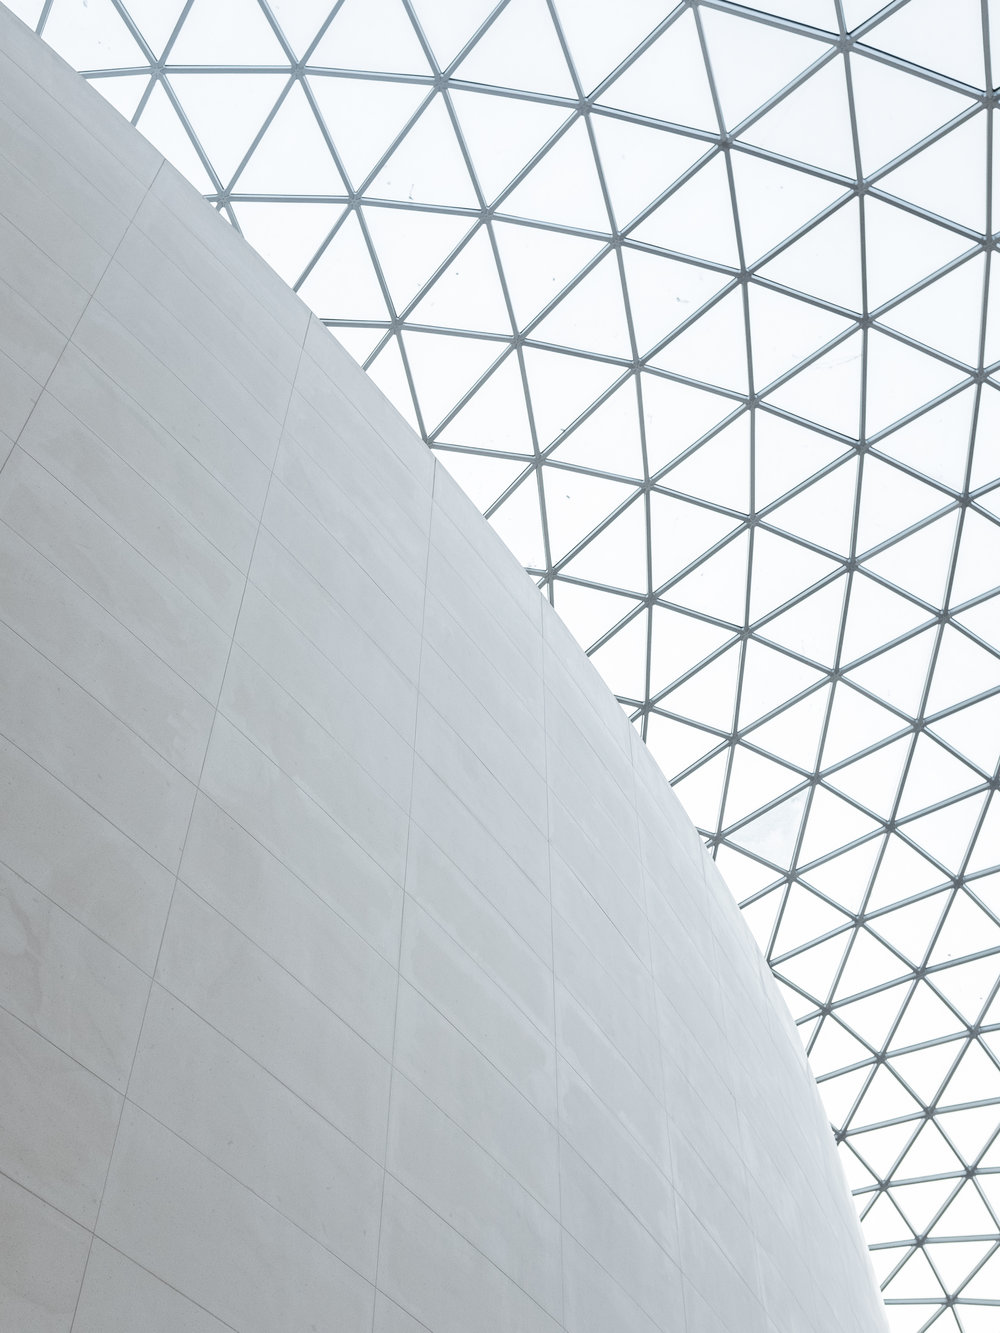 British Museum by Handover-17.jpg